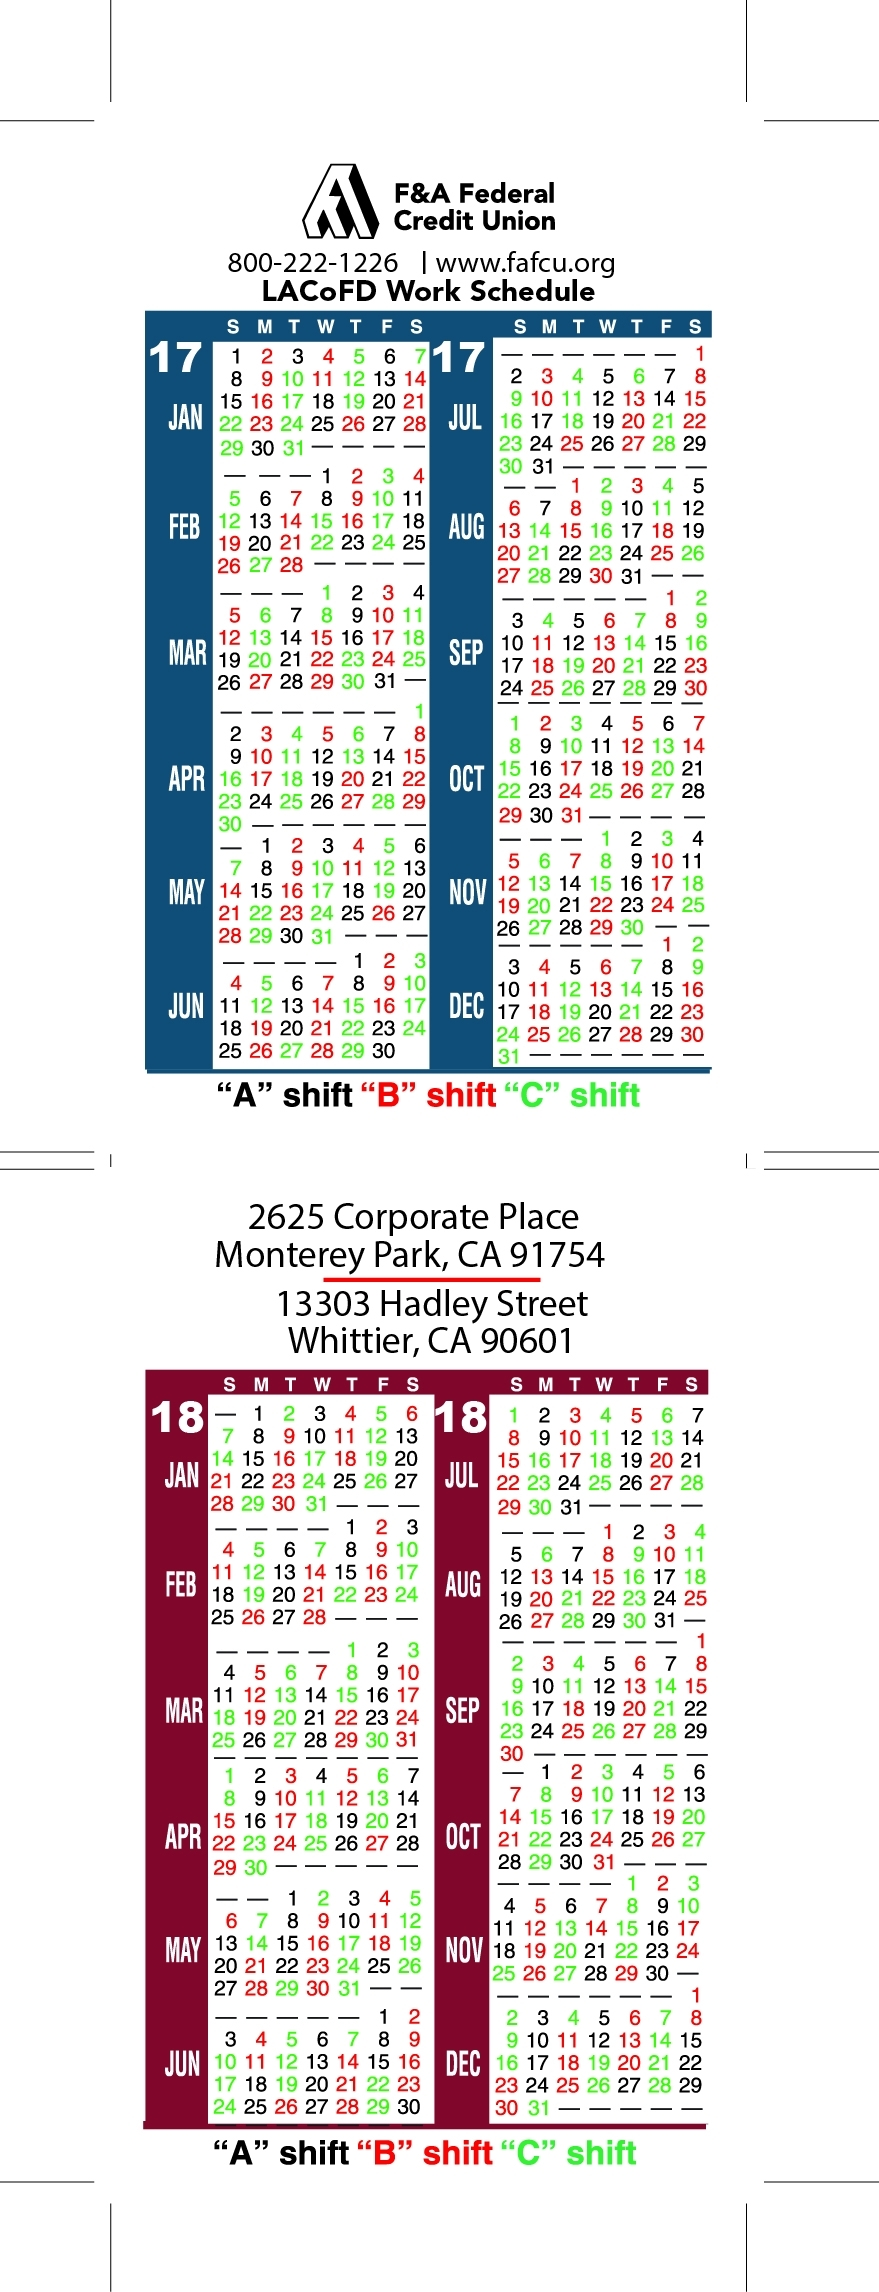 Houston Fire Department Shift Calendar   Printable Calendar 2020-2021